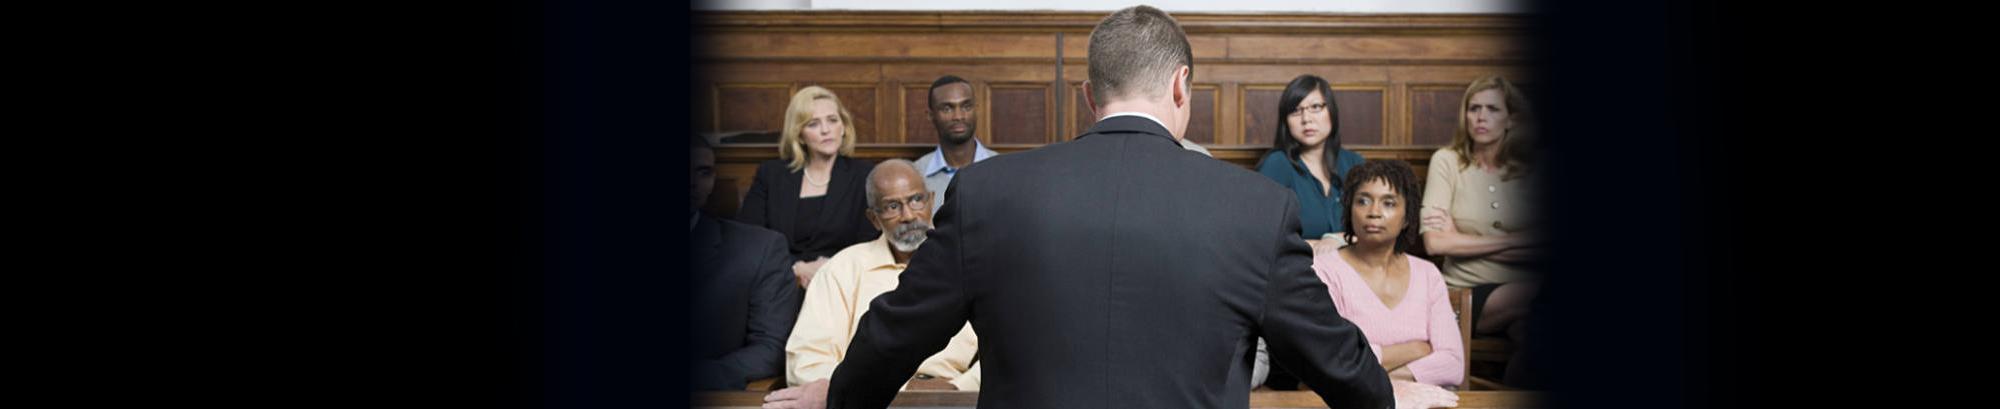 jury-new